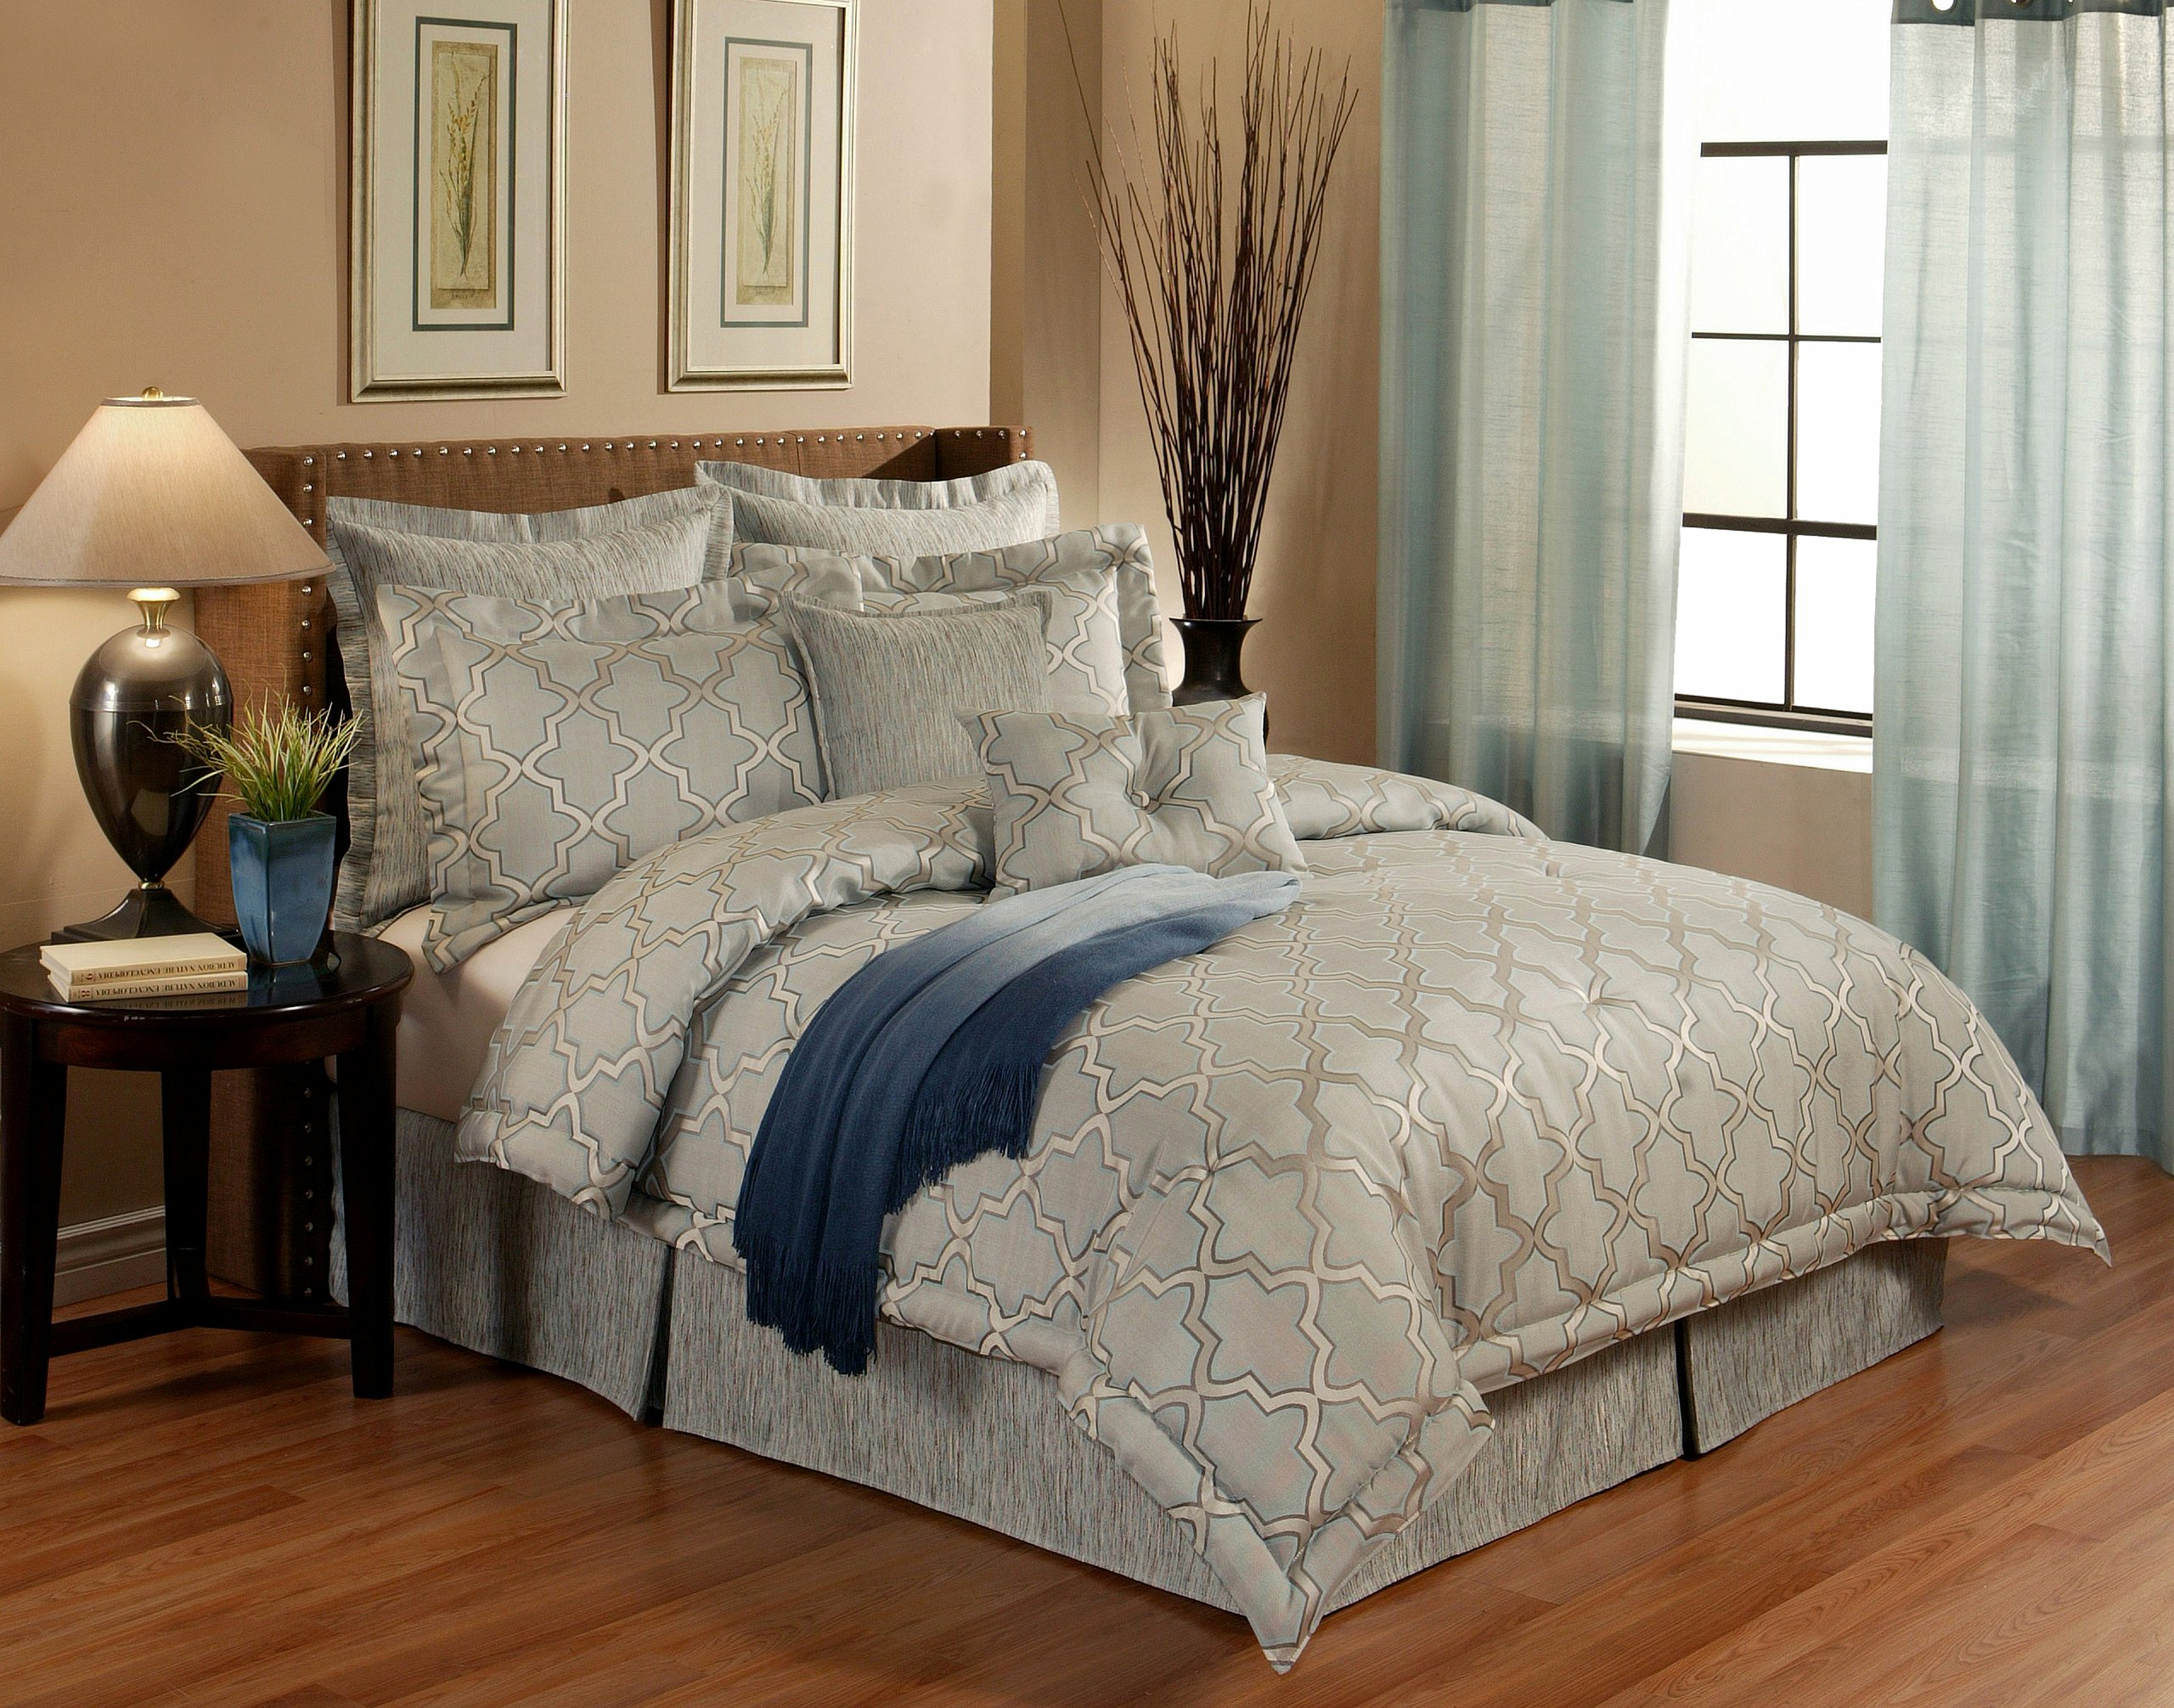 Austin Horn En Vogue Modern Glamour 6 Piece Luxury Comforter Set, California King, Geometric, Spa Blue